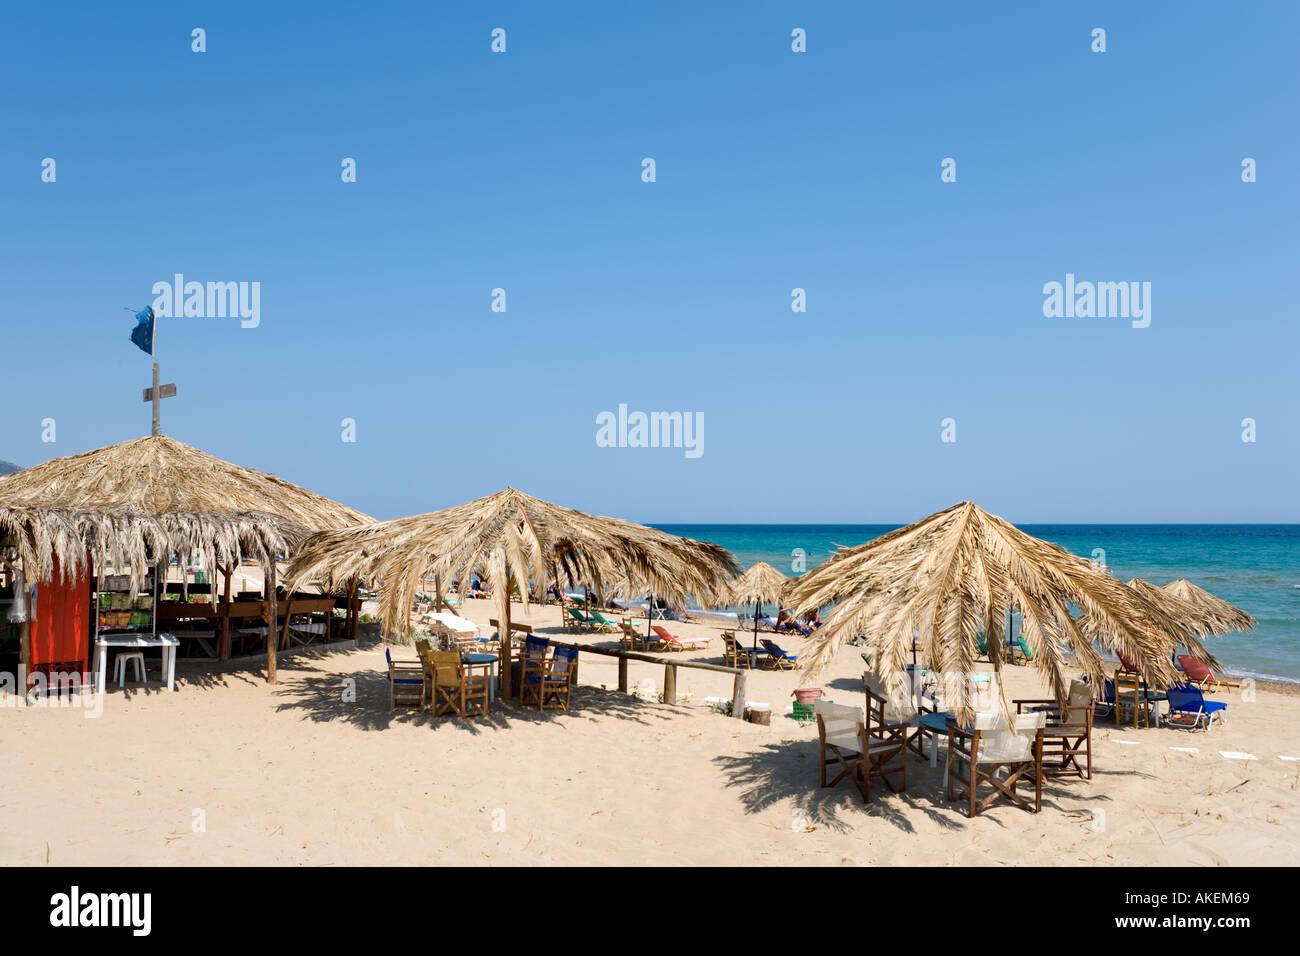 Beachfront Bar, Banana Beach, Vasilikos Peninsula, South East Coast, Zakynthos, Ionian Islands, Greece - Stock Image